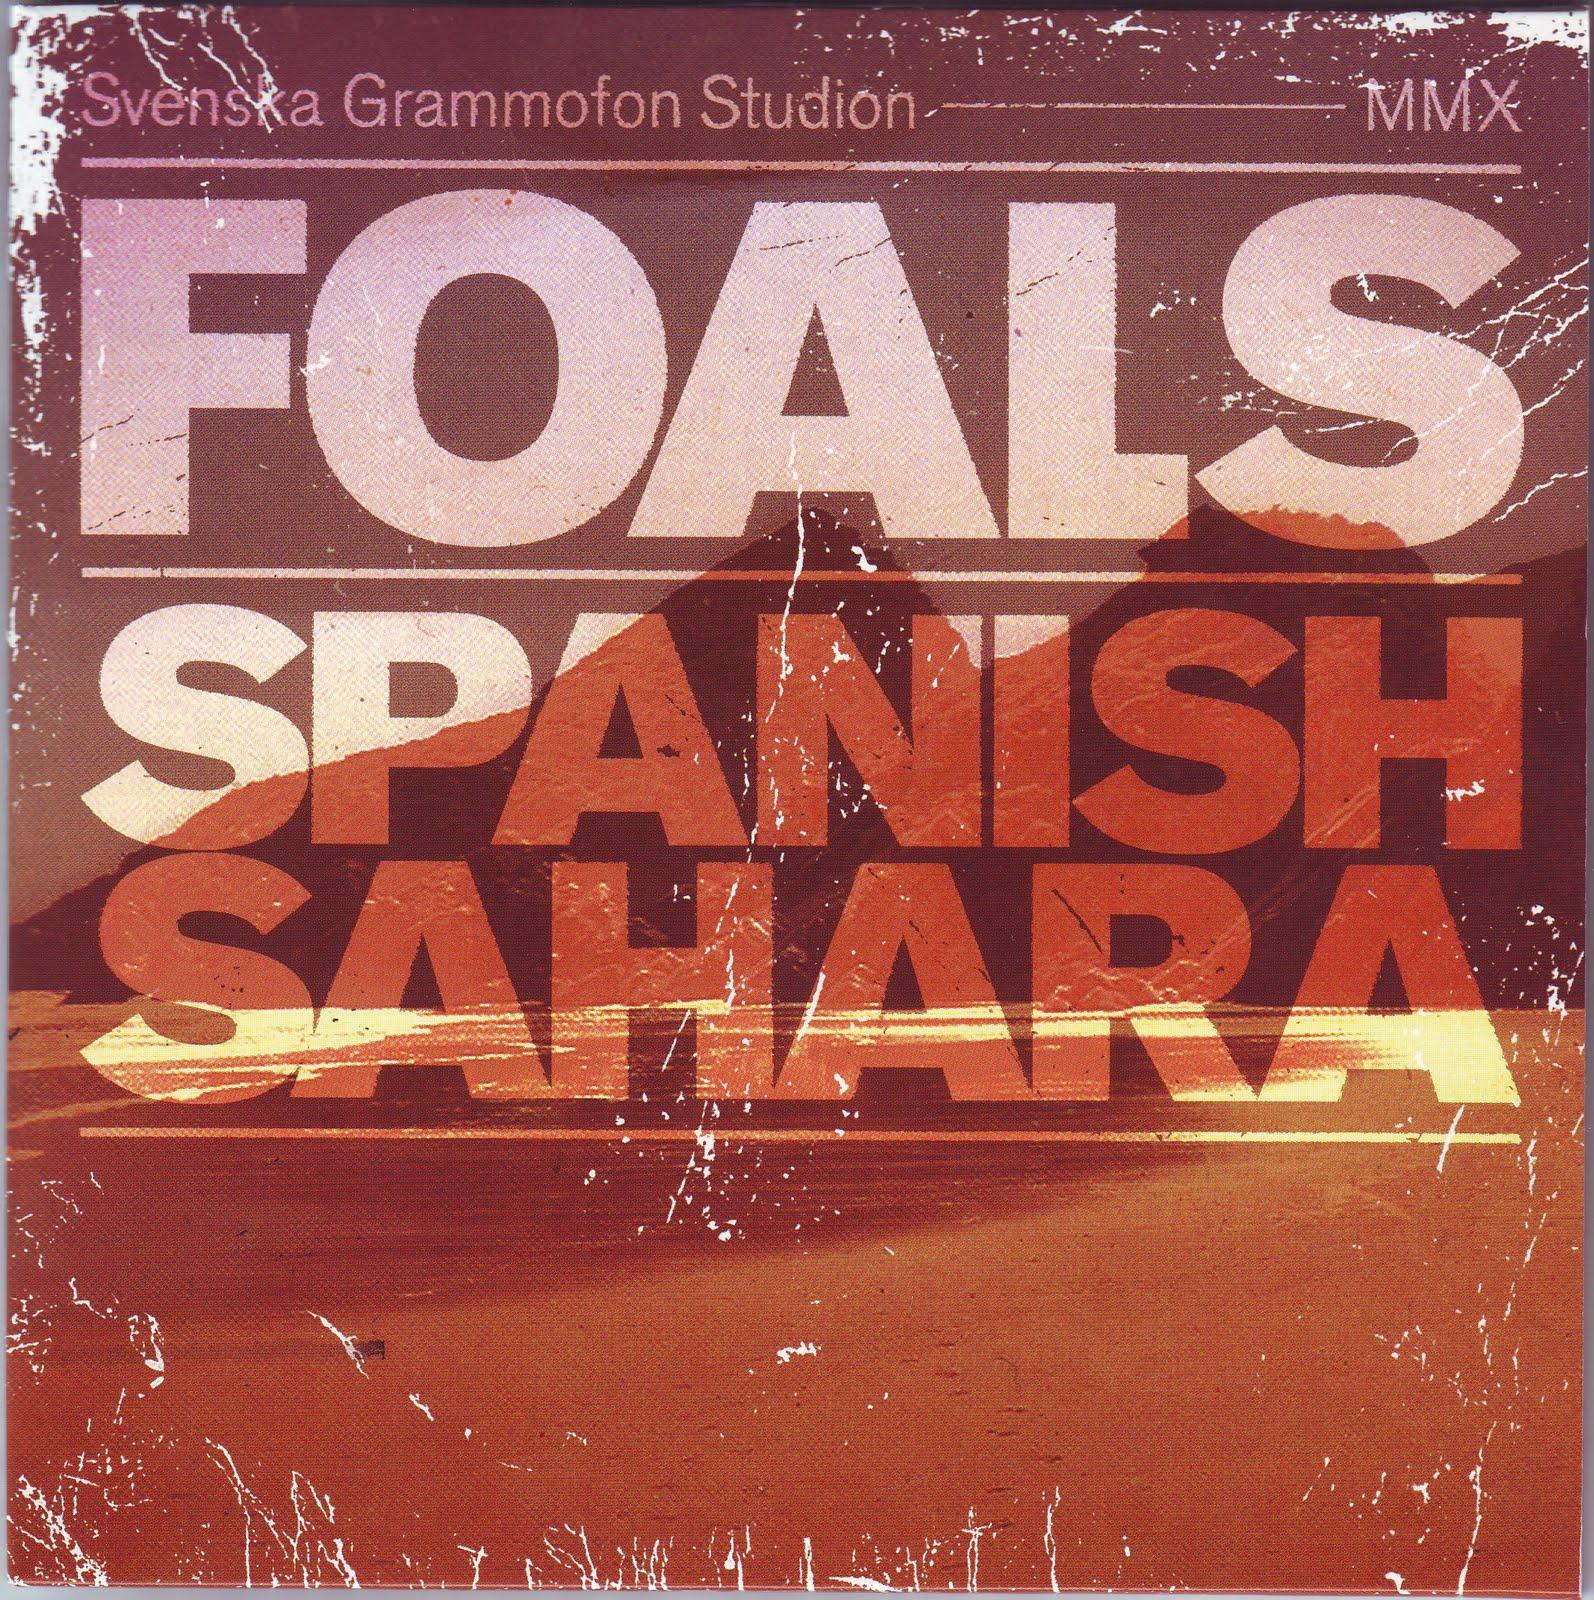 http://1.bp.blogspot.com/_VzUSulyxBZI/S_A69r2AdaI/AAAAAAAABps/0iNlayZdFZ8/s1600/Foals+Spanish+Sahara.jpg